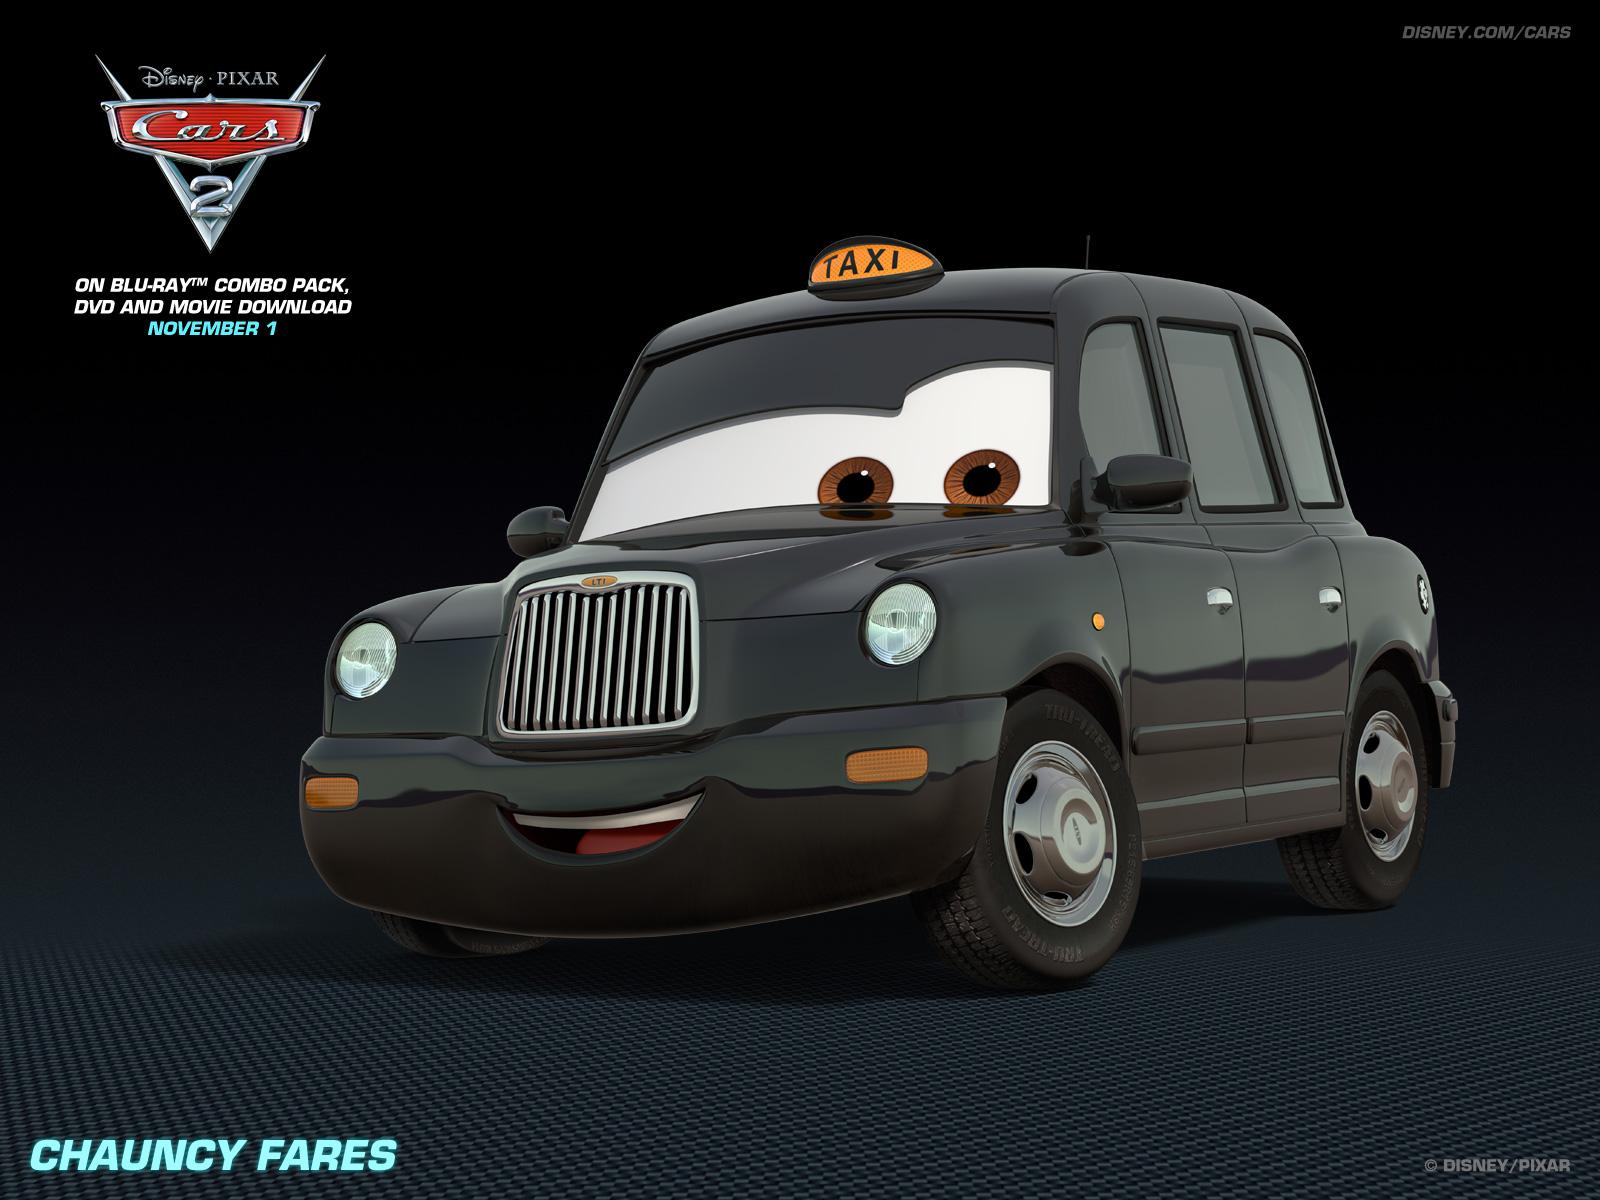 Disney pixar cars 2 chauncy fares